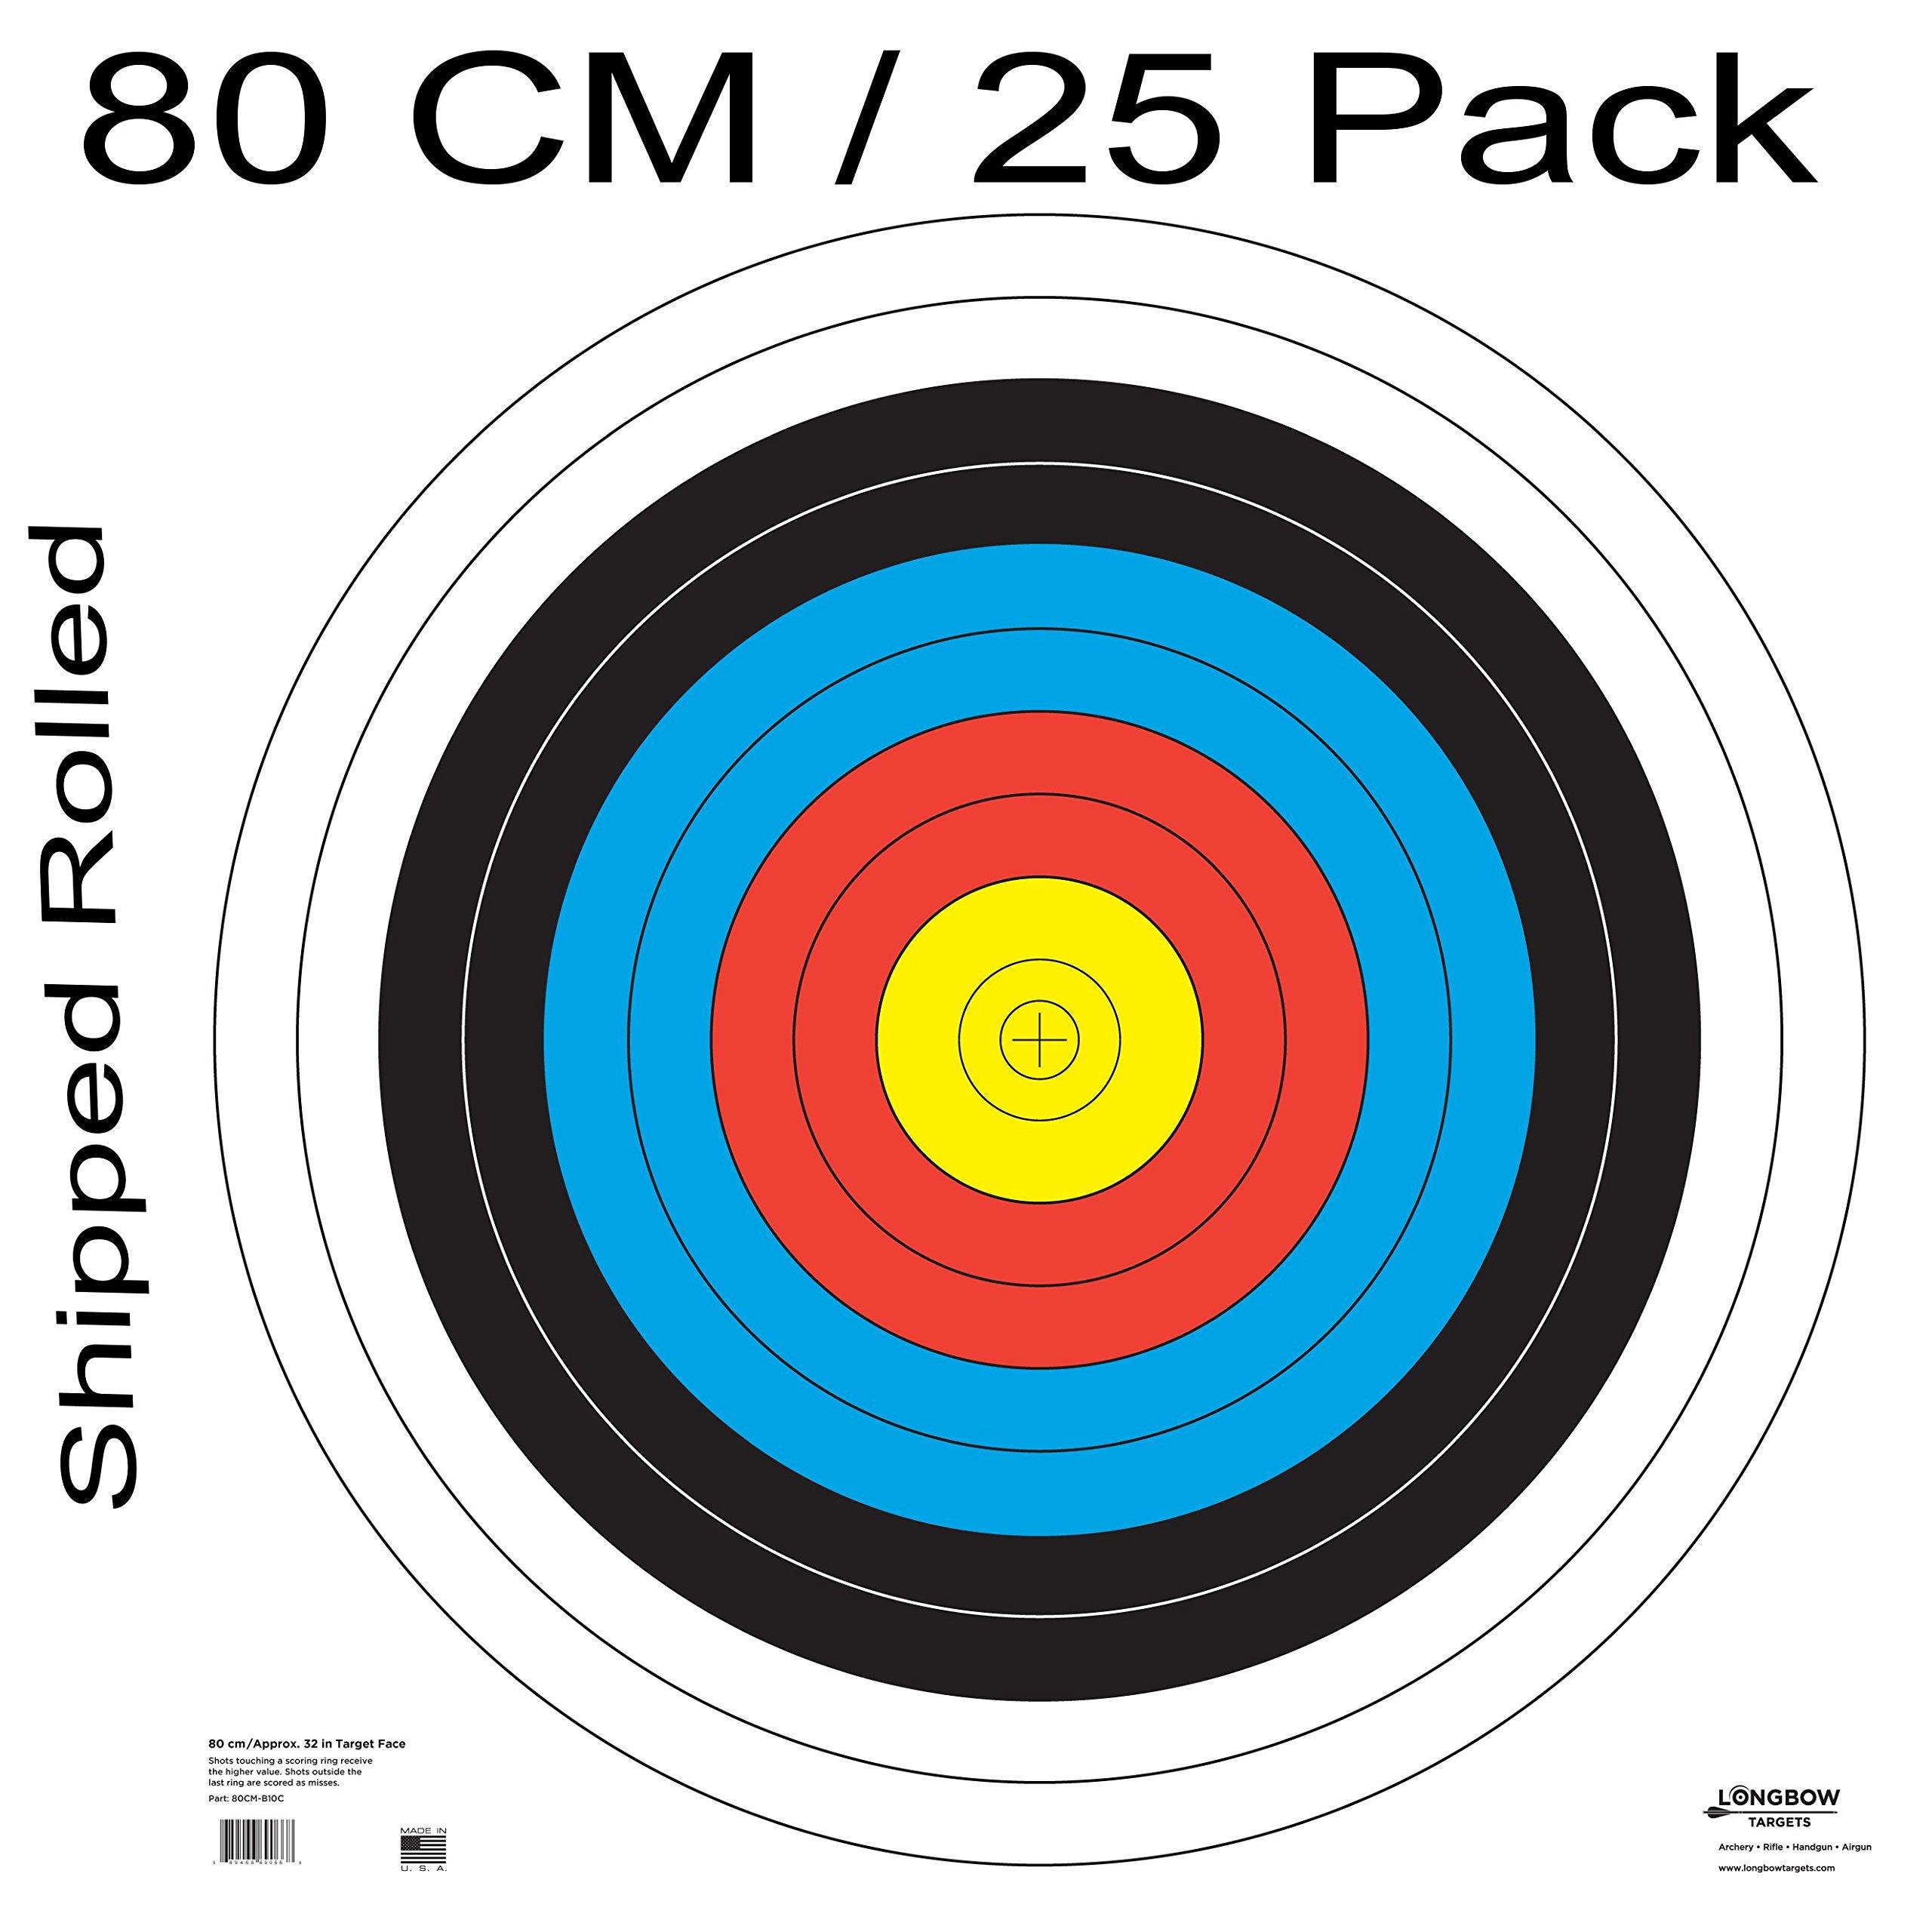 Archery 40cm & 80cm Targets by Longbow (25 Pack, 80cm Archery Paper)